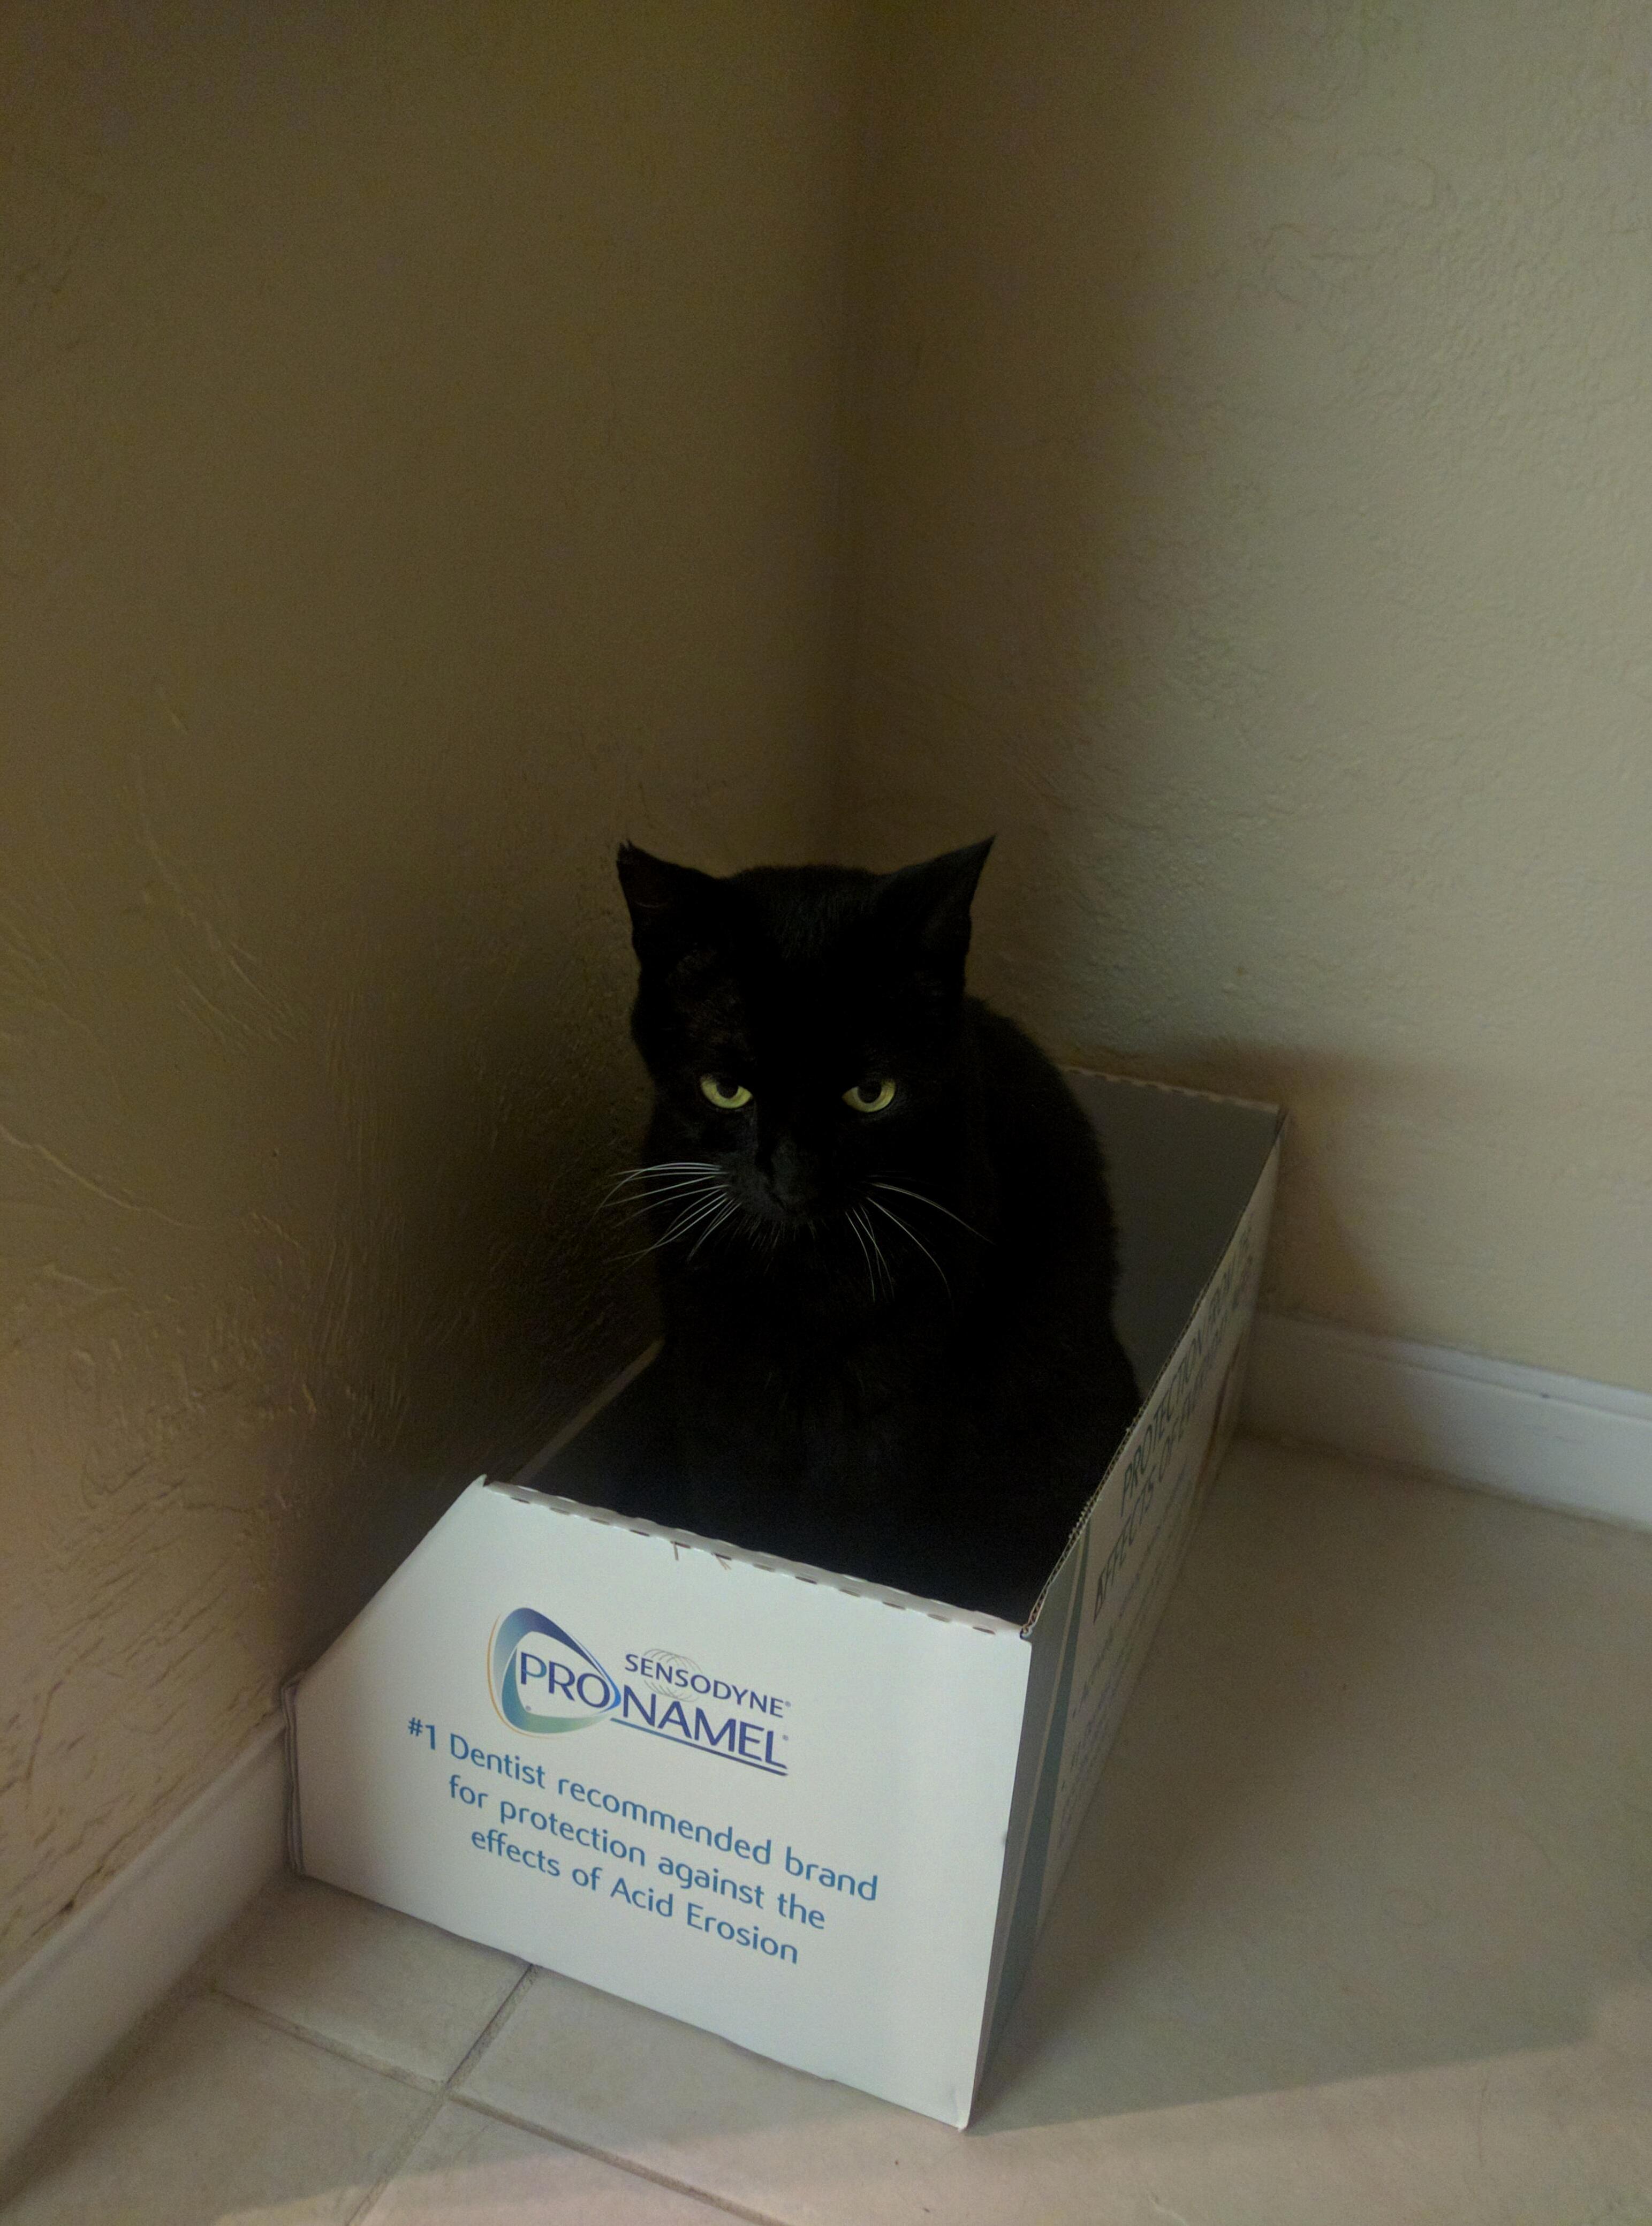 Spooky cat sits in box.